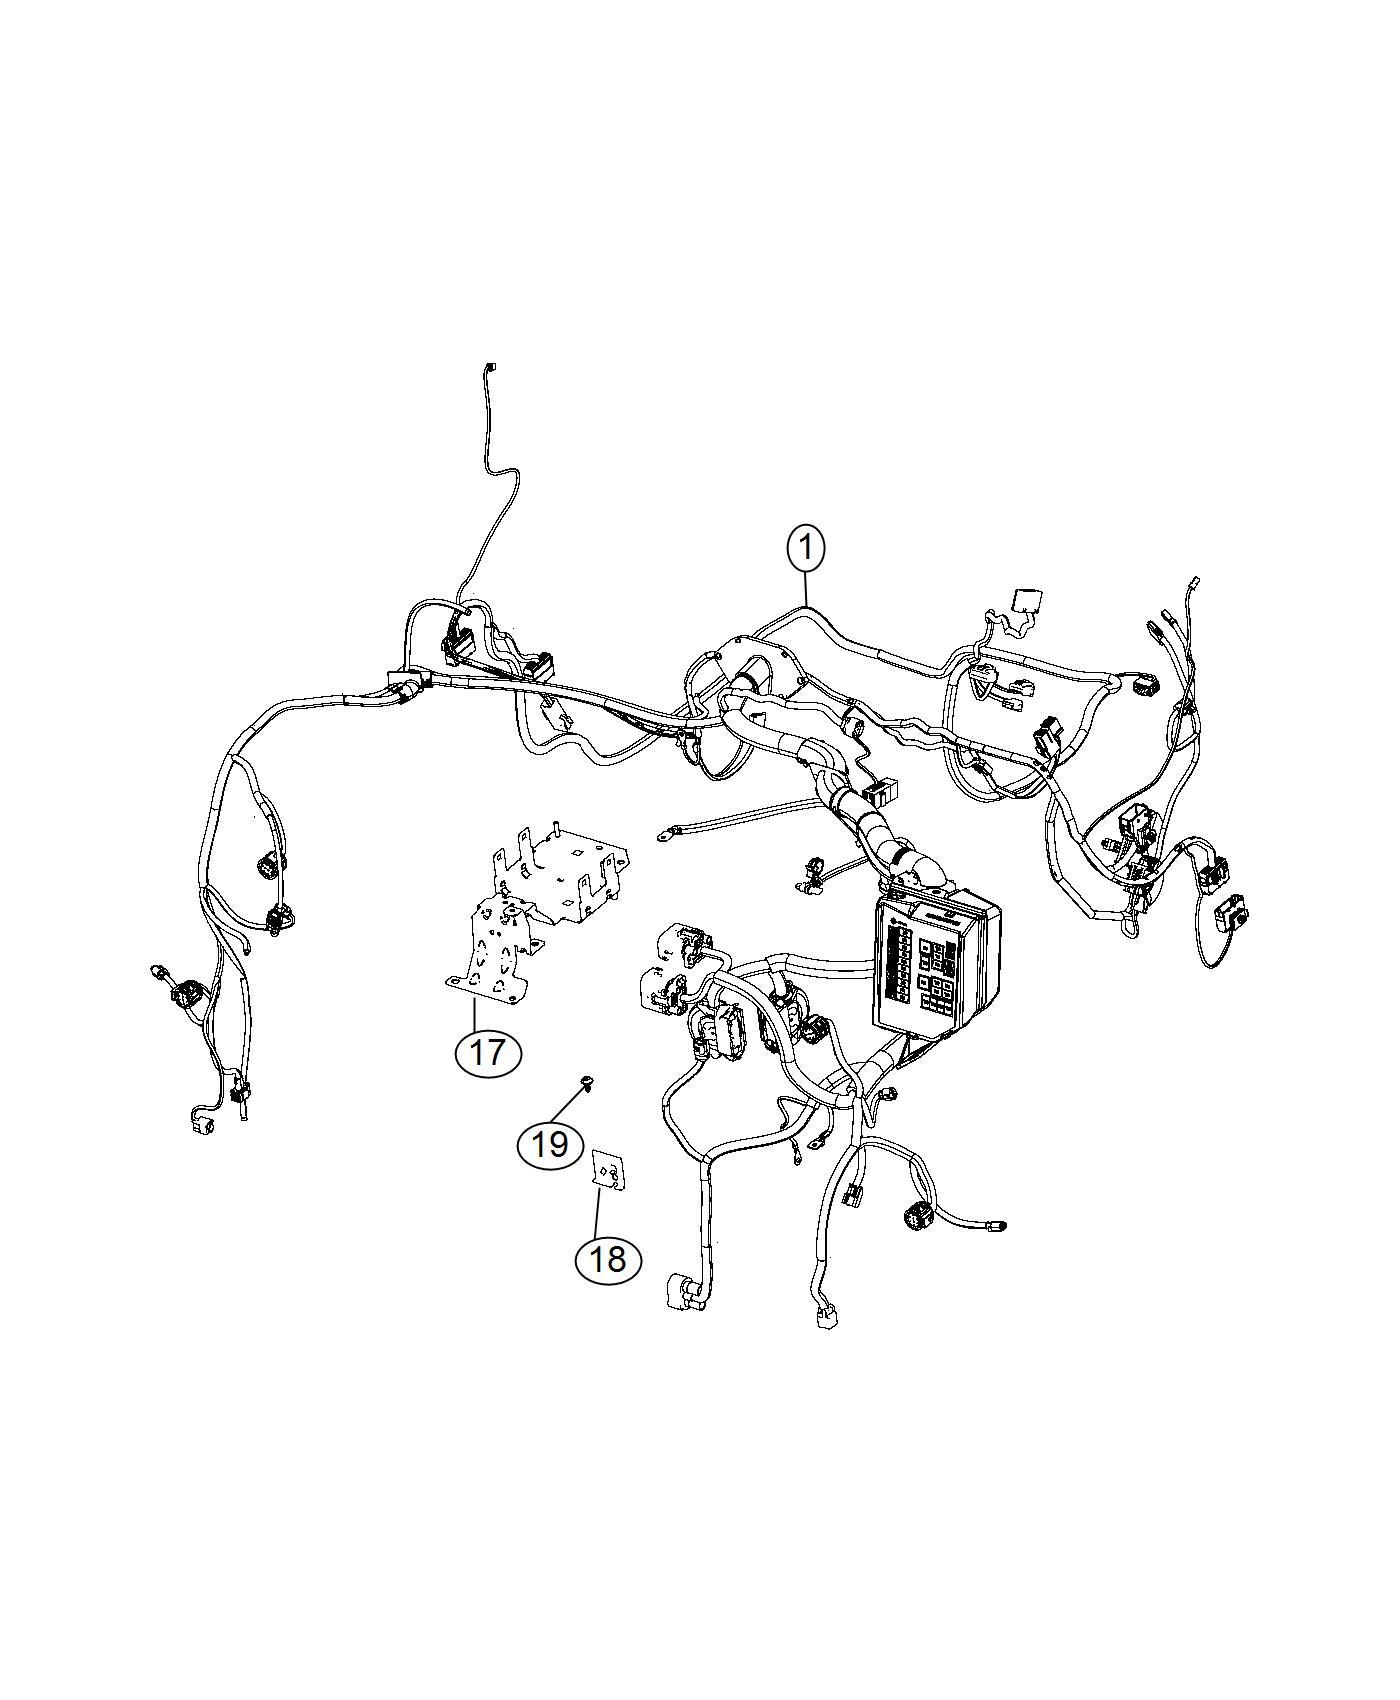 Fiat 500C Wiring. Headlamp to dash. Speakers, marked